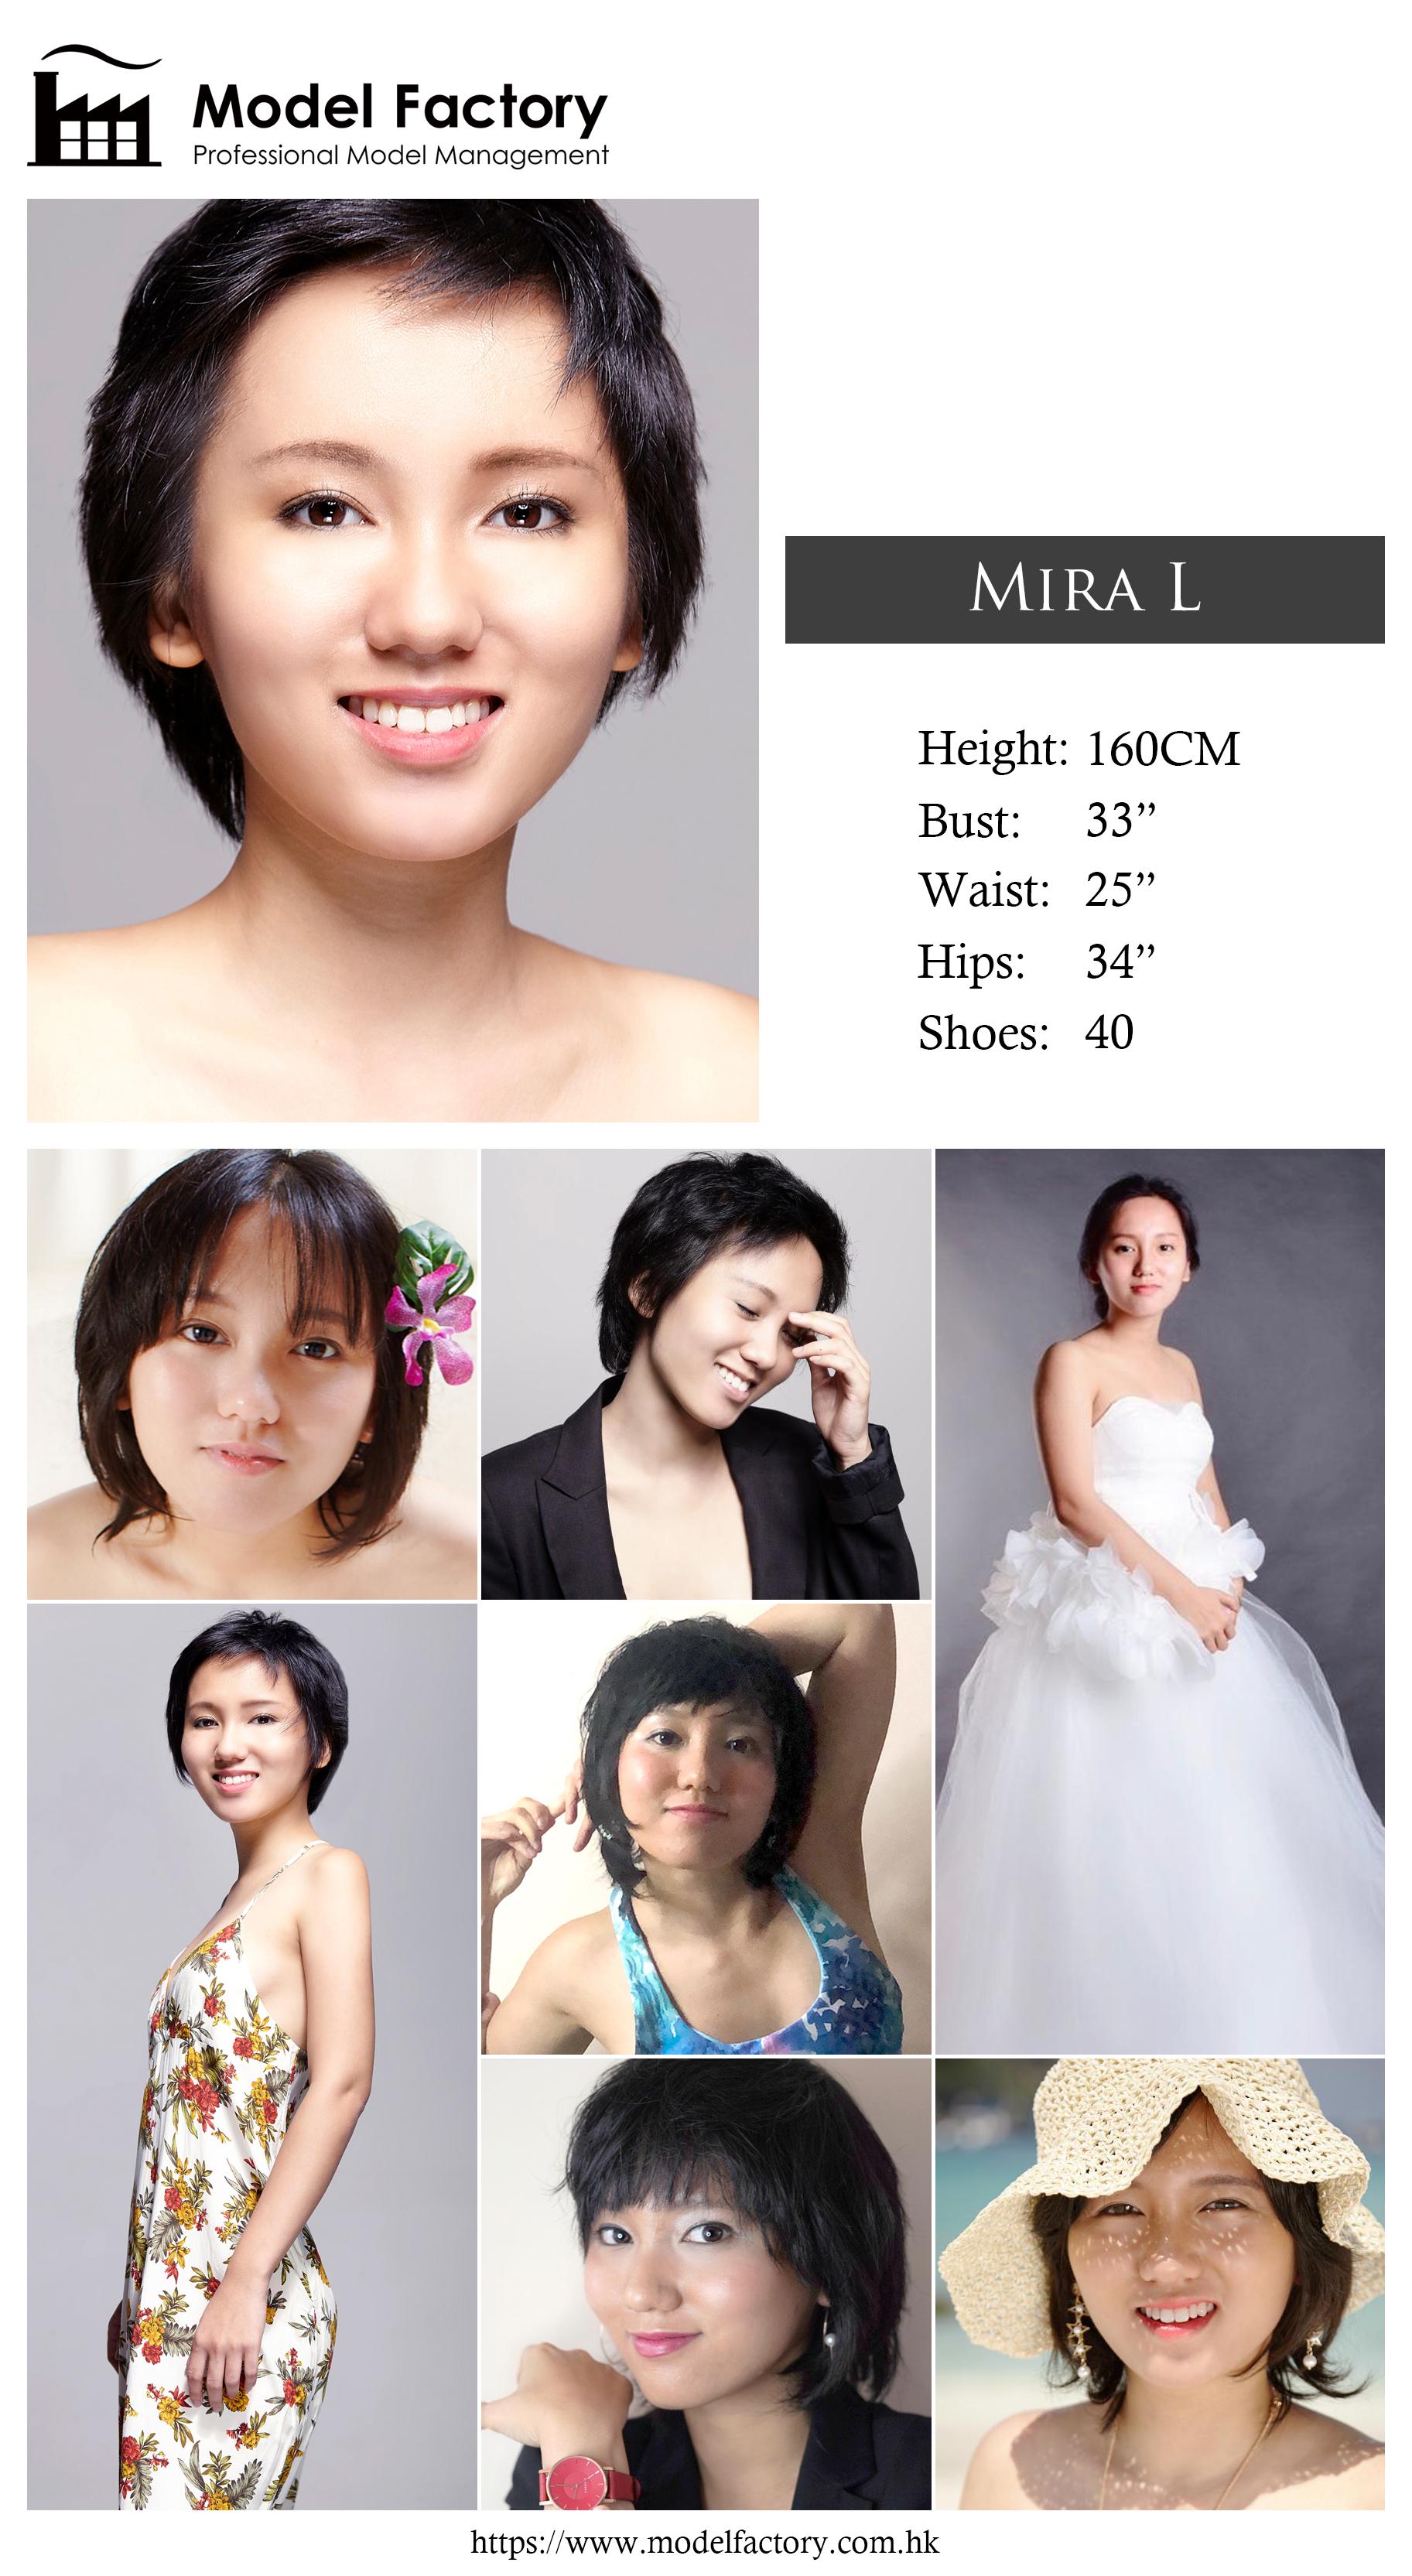 Model Factory Hong Kong Female Model MiraL